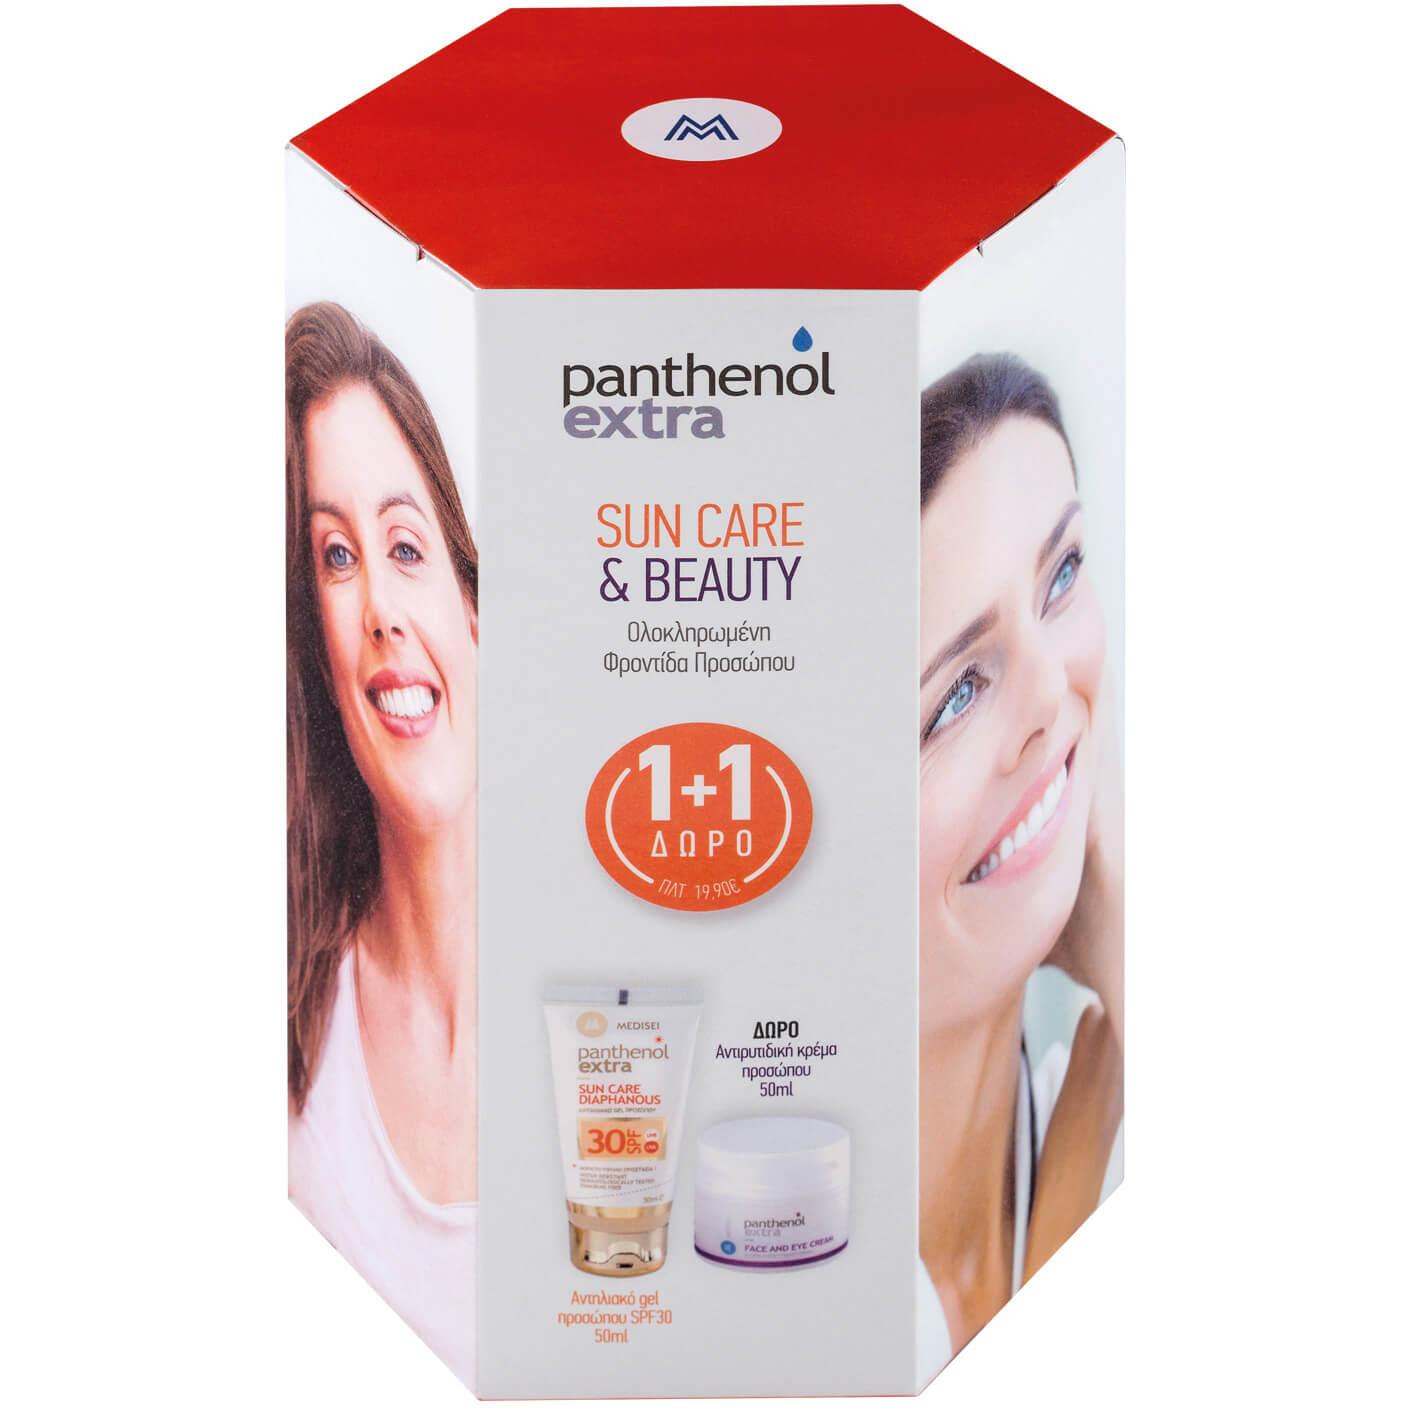 Panthenol Extra Πακέτο Προσφοράς Sun Care Diaphanous FaceSpf30 Αντηλιακό Gel Προσώπου 50ml & Δώρο 24ωρη Αντιρυτιδική Κρέμα 50ml